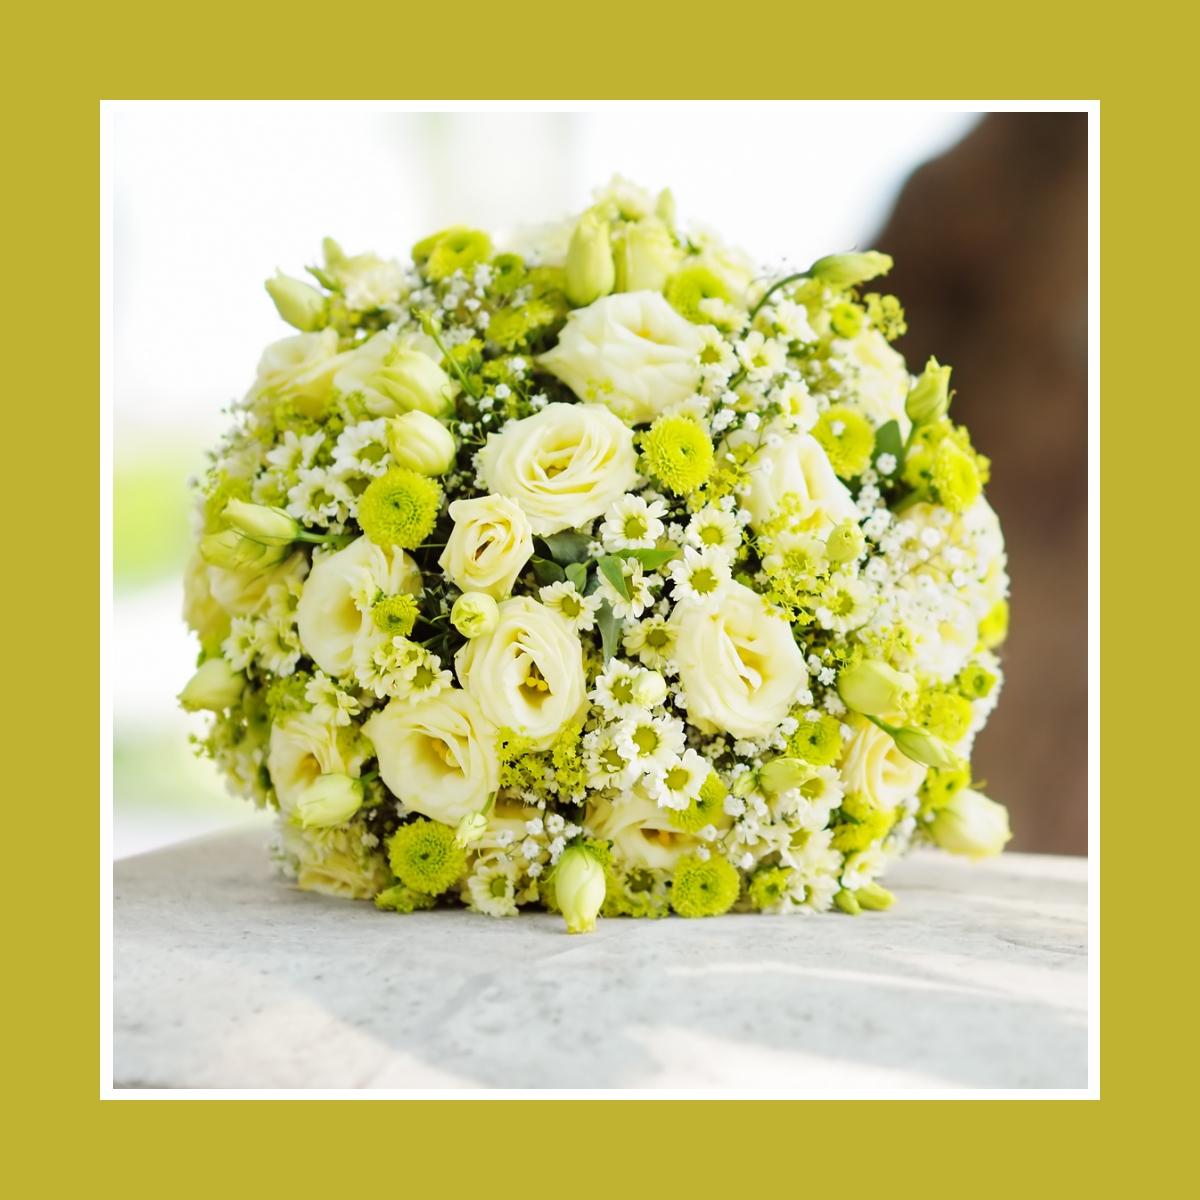 Brautstrauß Kugel aus Rosen Chrysanthemen & Kamillen